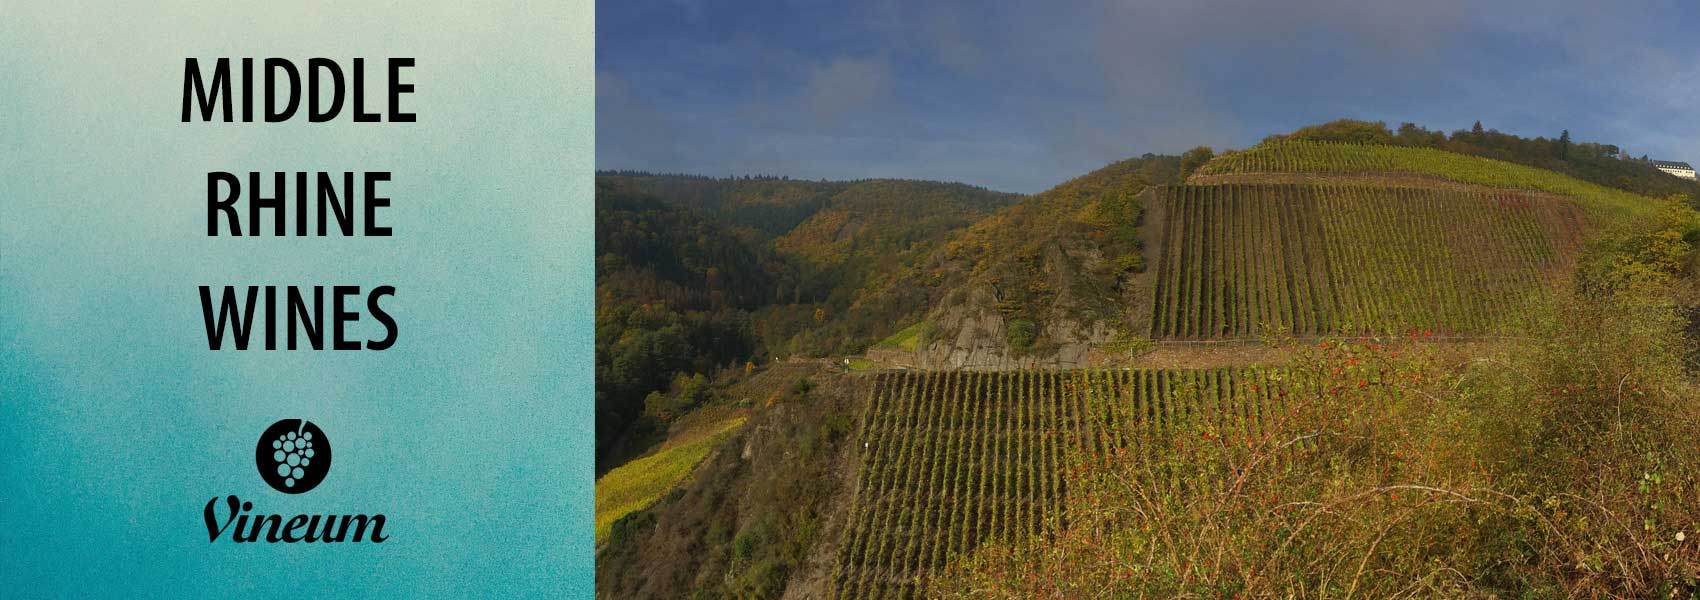 Middle Rhine Wines